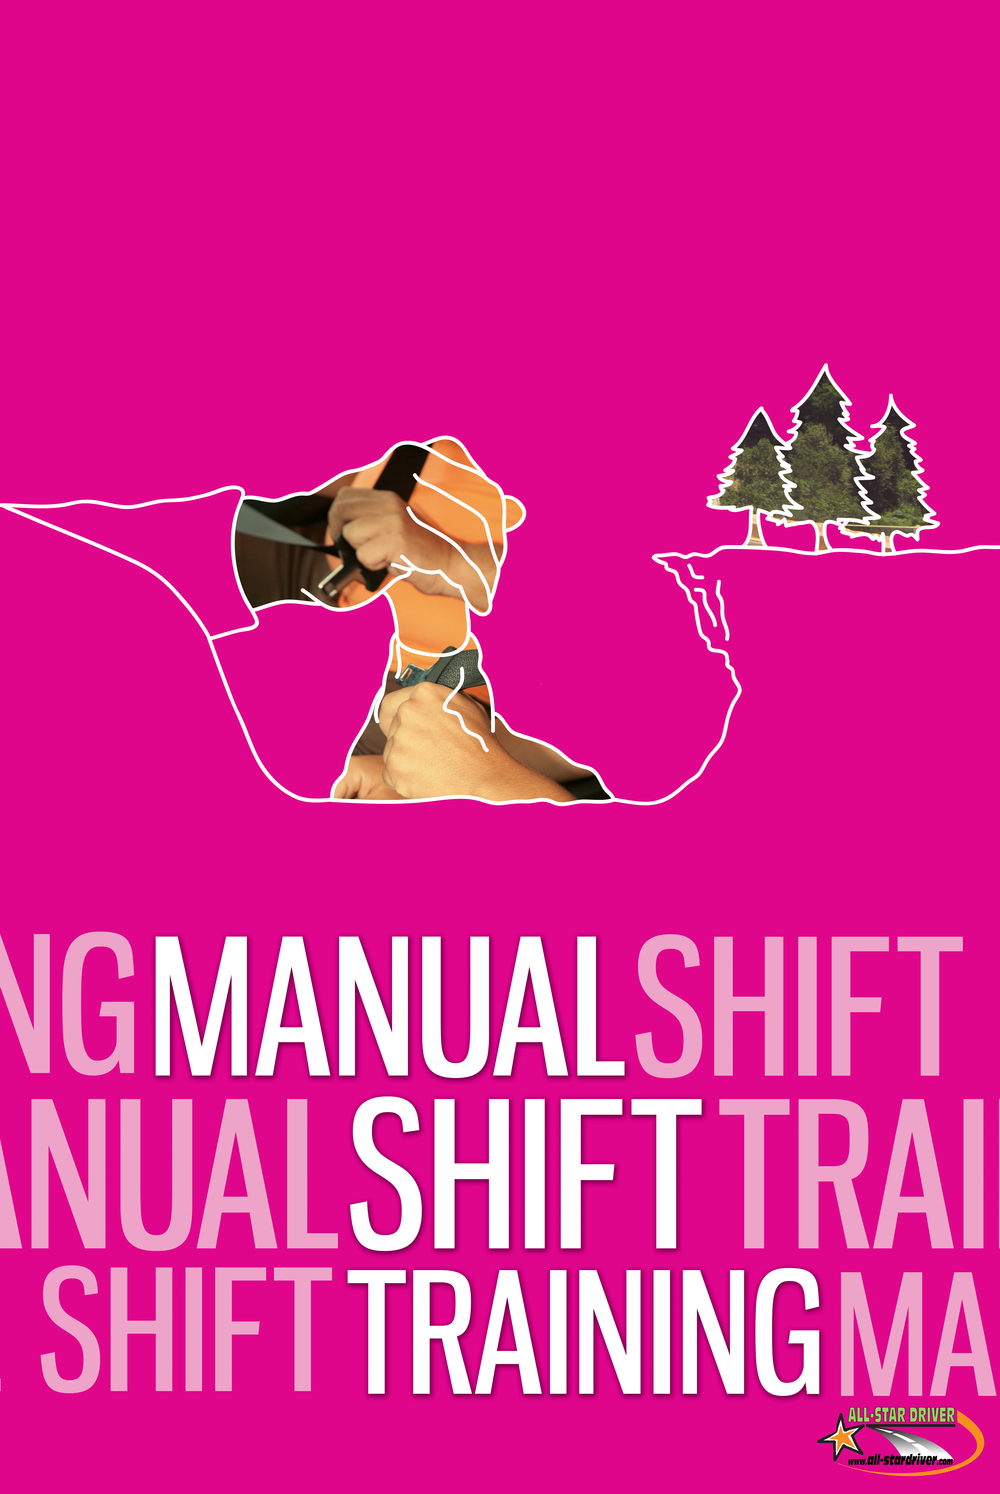 ASD Poster Manual Shift Training.jpg